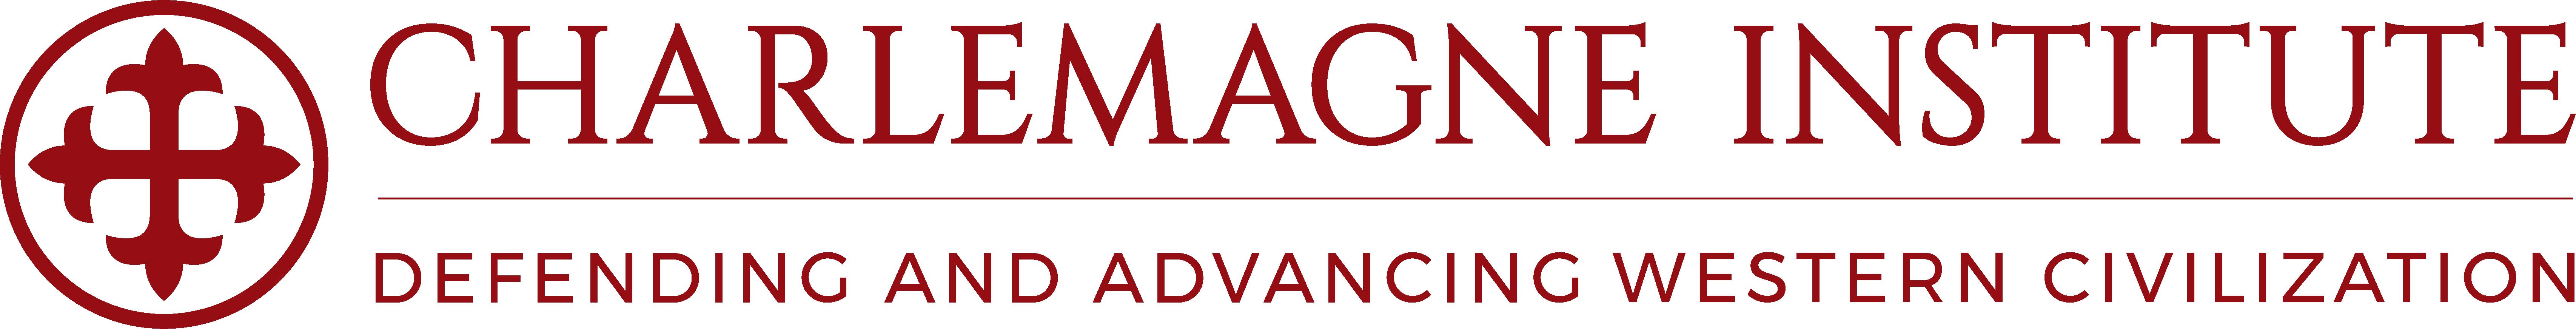 Charlemagne Institute